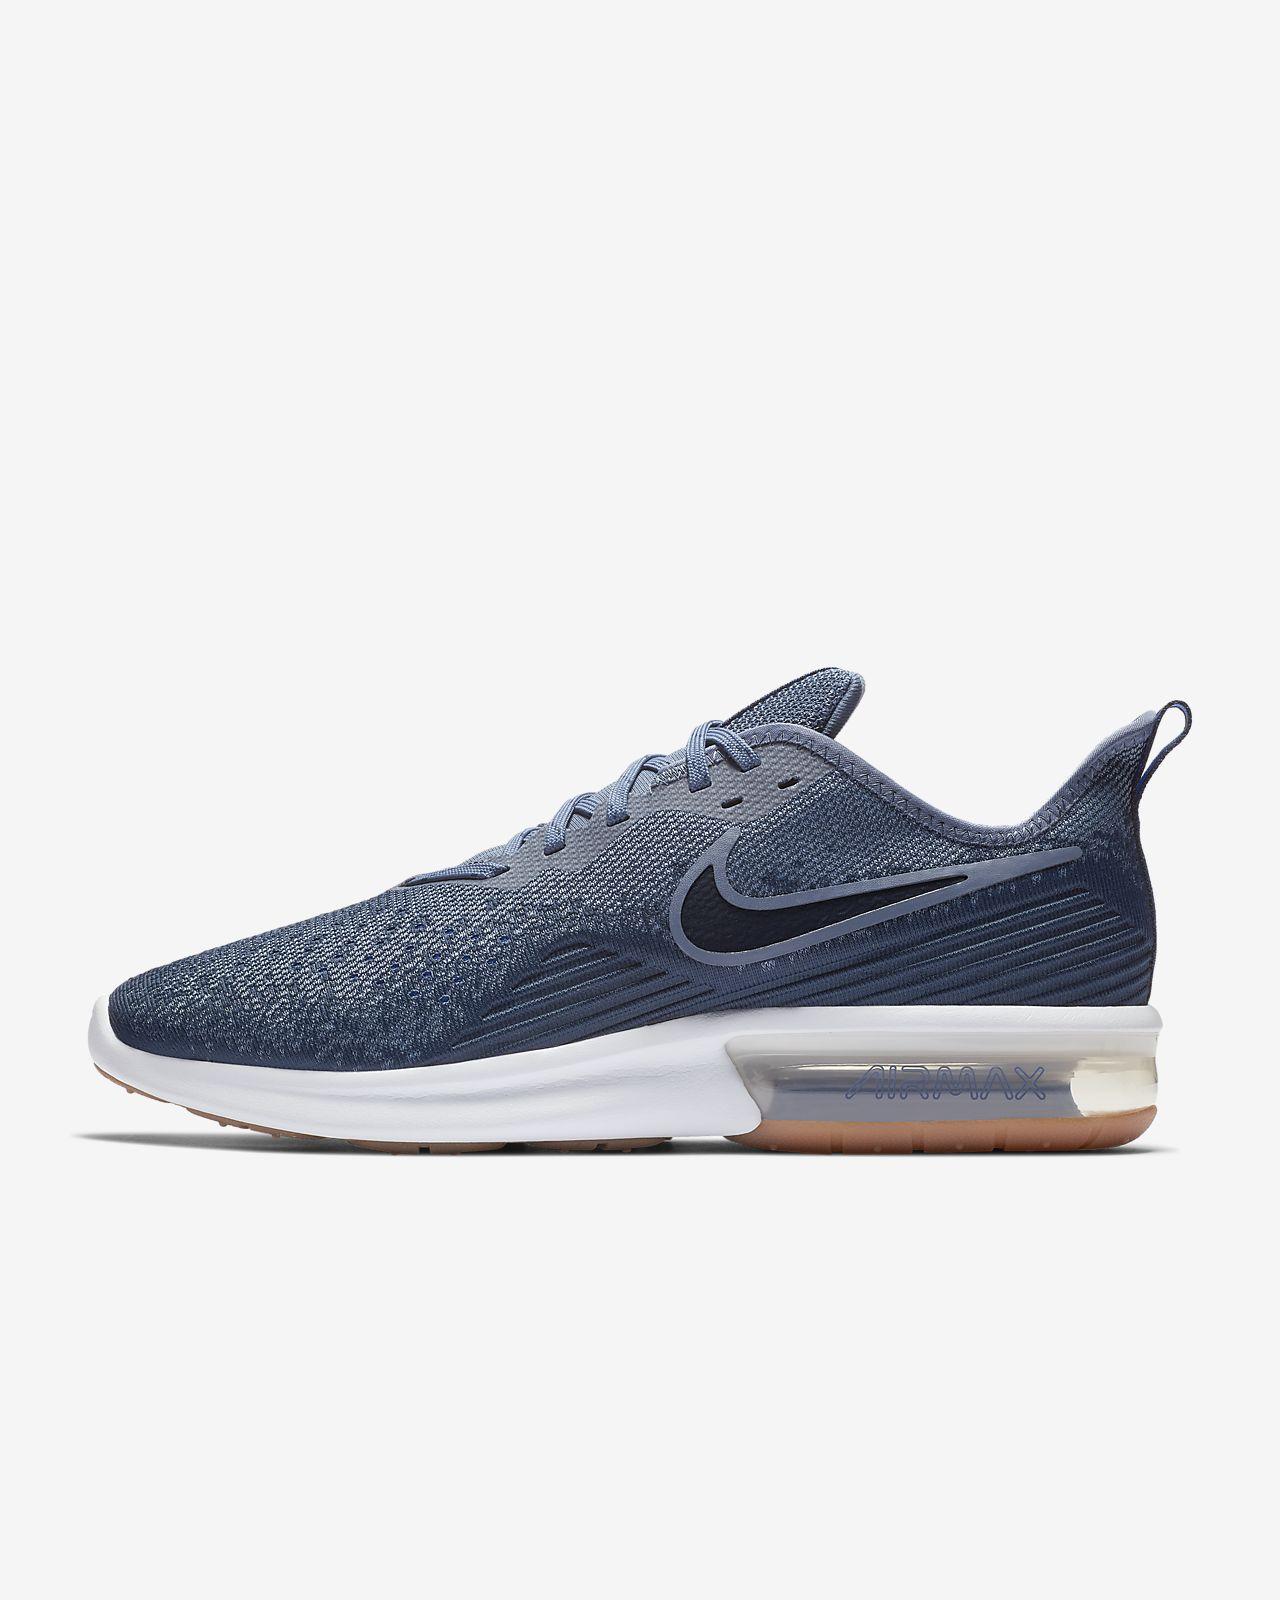 ecfb90a2c43ebb Nike Air Max Sequent 4 Men s Shoe. Nike.com BE